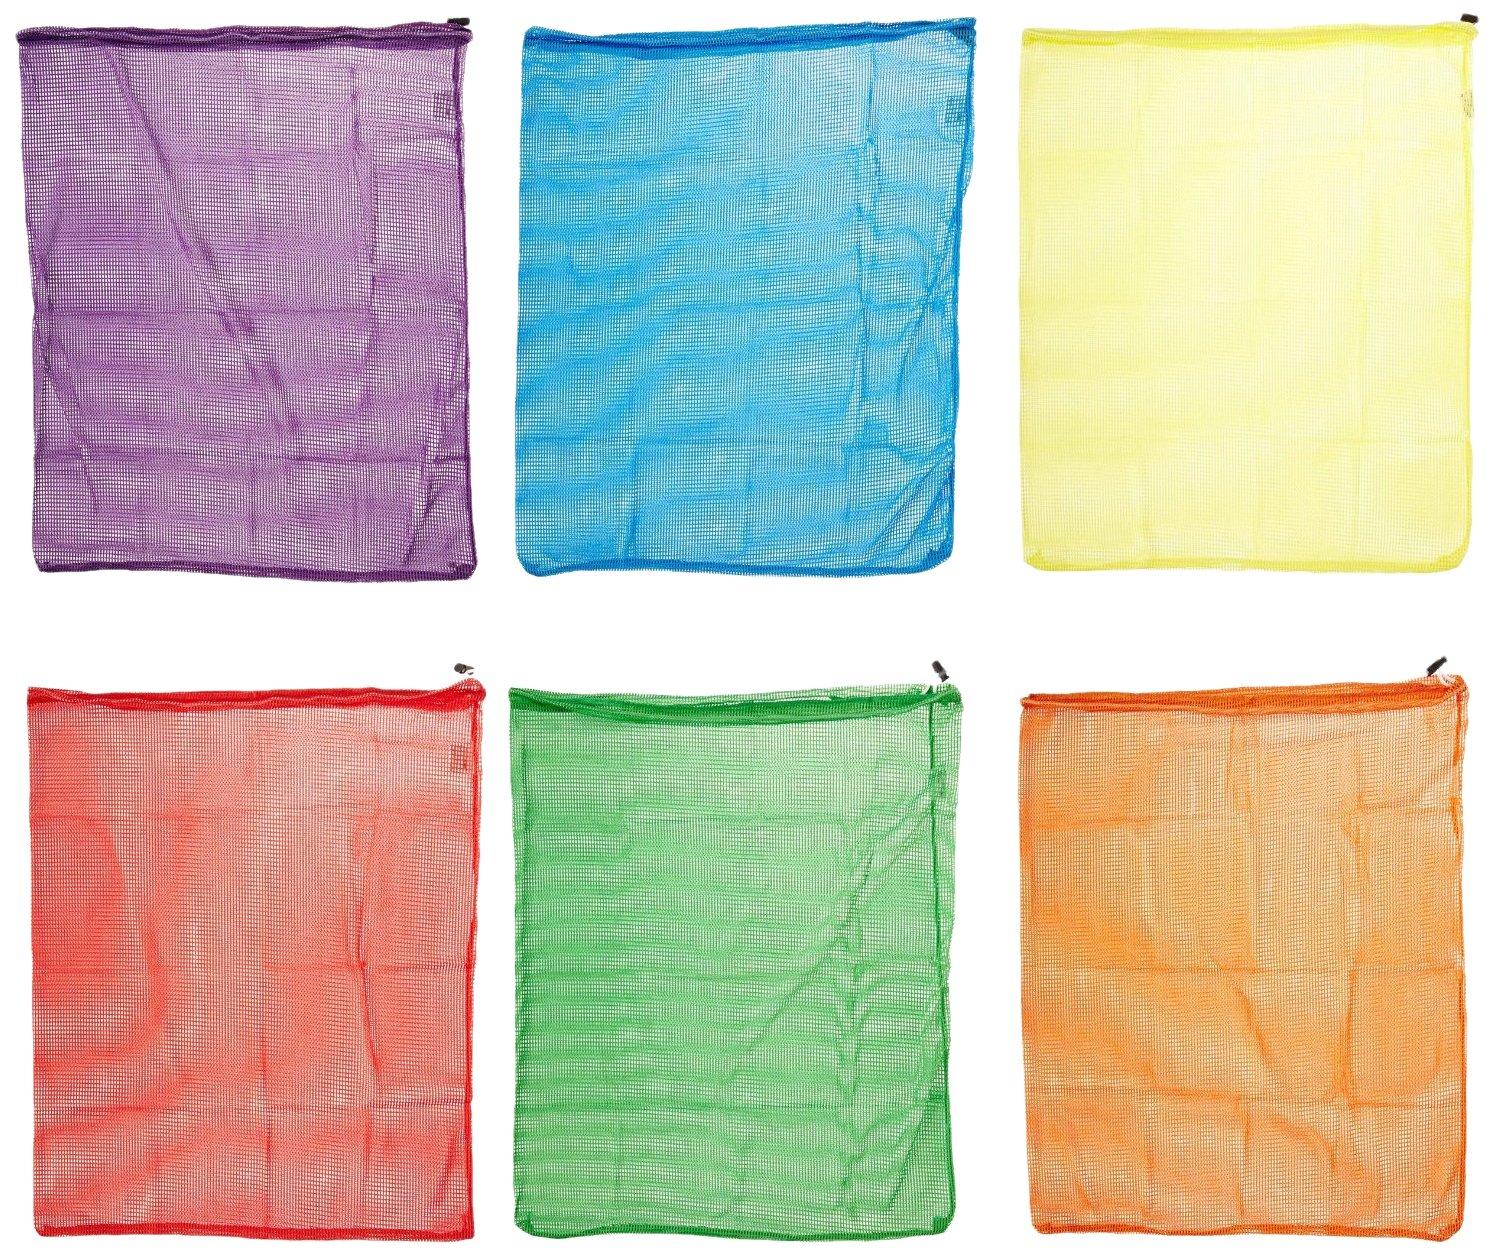 Amazon.com: Sportime Mesh Drawstring Storage Bags - 24 x 34 inches ...